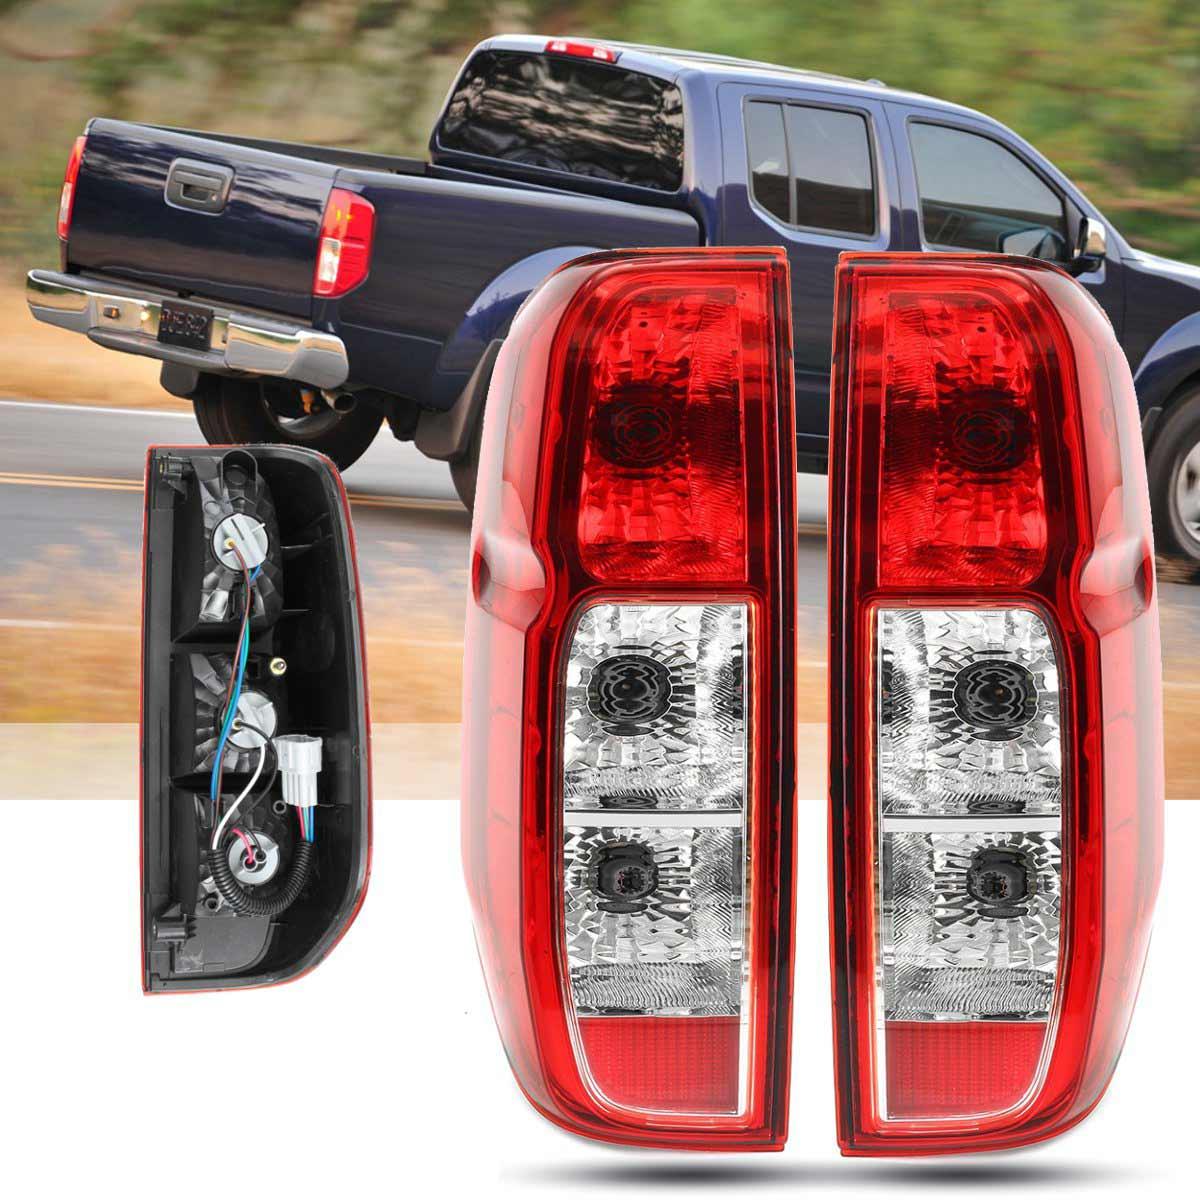 Red Rear Tail Light Brake Lamp Rear Brake Light Rear Warning Lamp For Nissan Navara D40 2005 2006 2007 2008 2009 2010 2011-2015